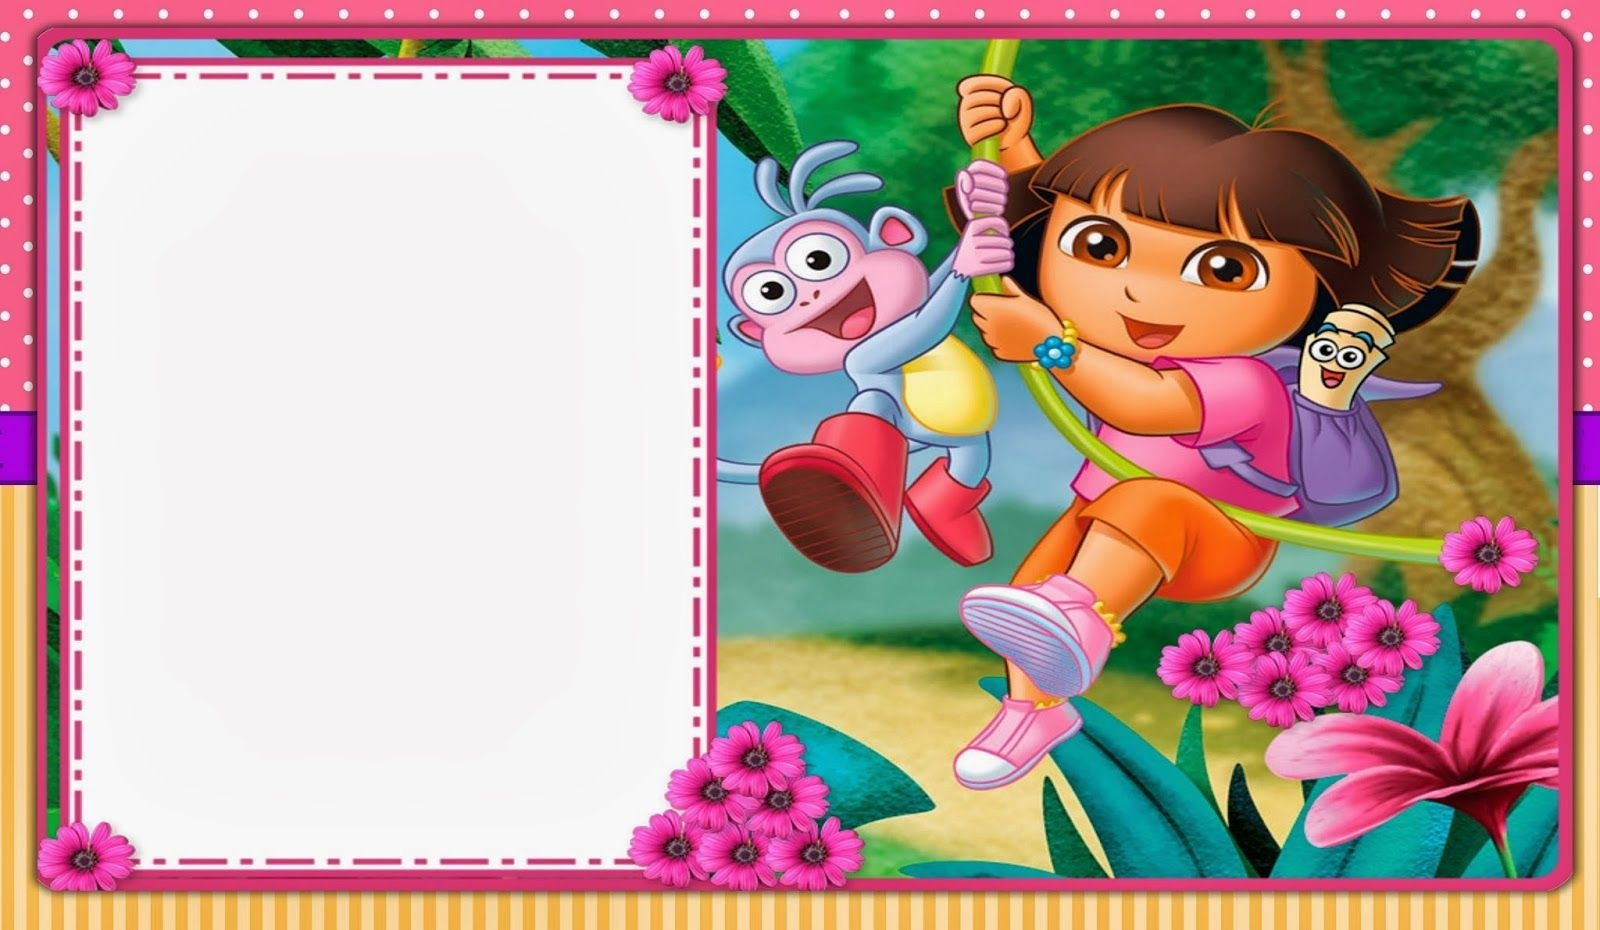 Dora The Explorer: Free Printable Invitations And Party Printables - Dora The Explorer Free Printable Invitations